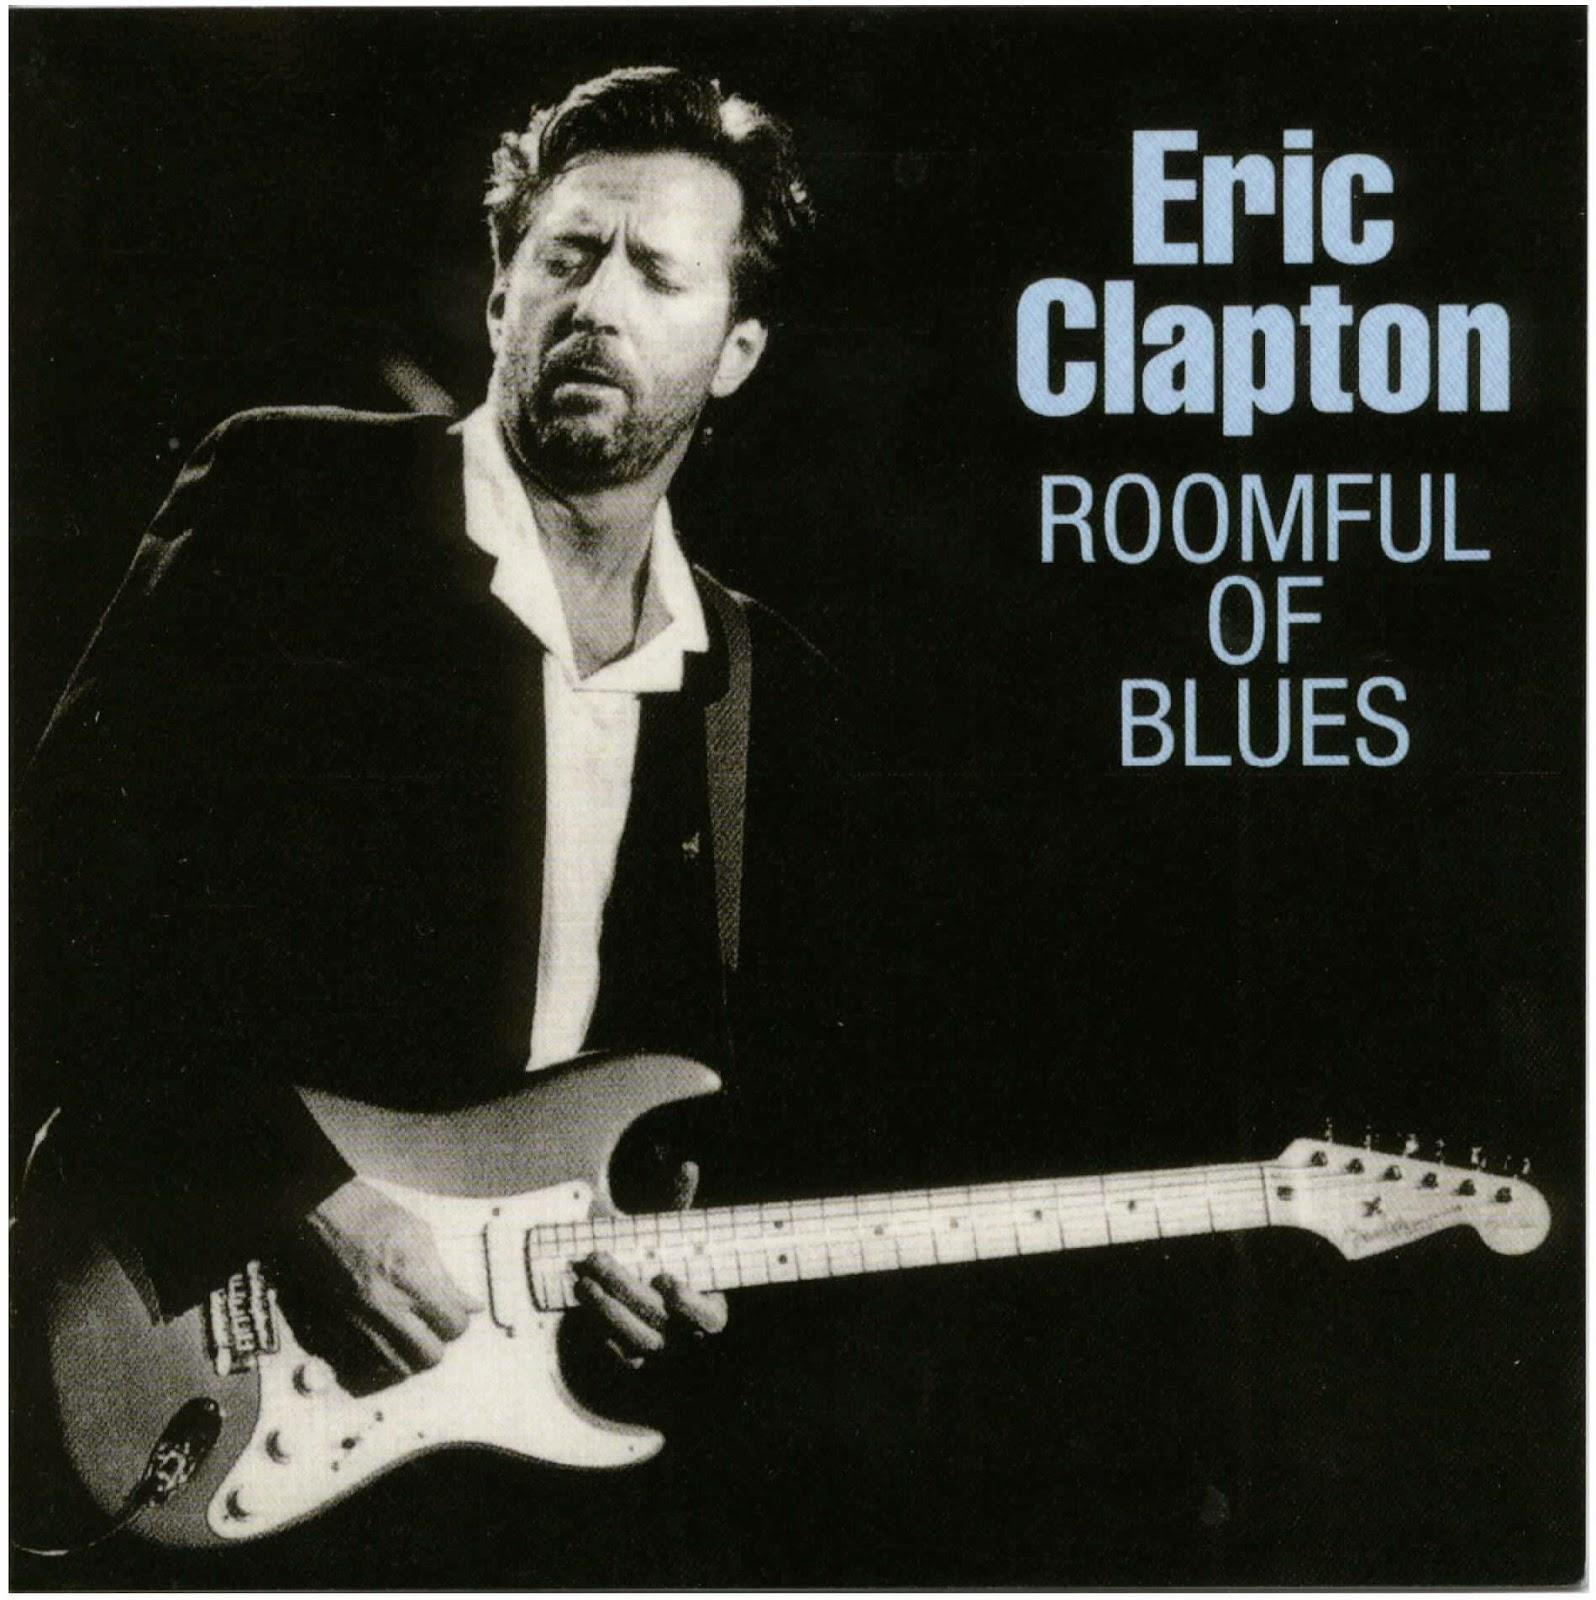 Wonderful Tonight Live Eric Clapton: PLUMDUSTY'S PAGE: Eric Clapton 1989-07-06 Roomful Of Blues